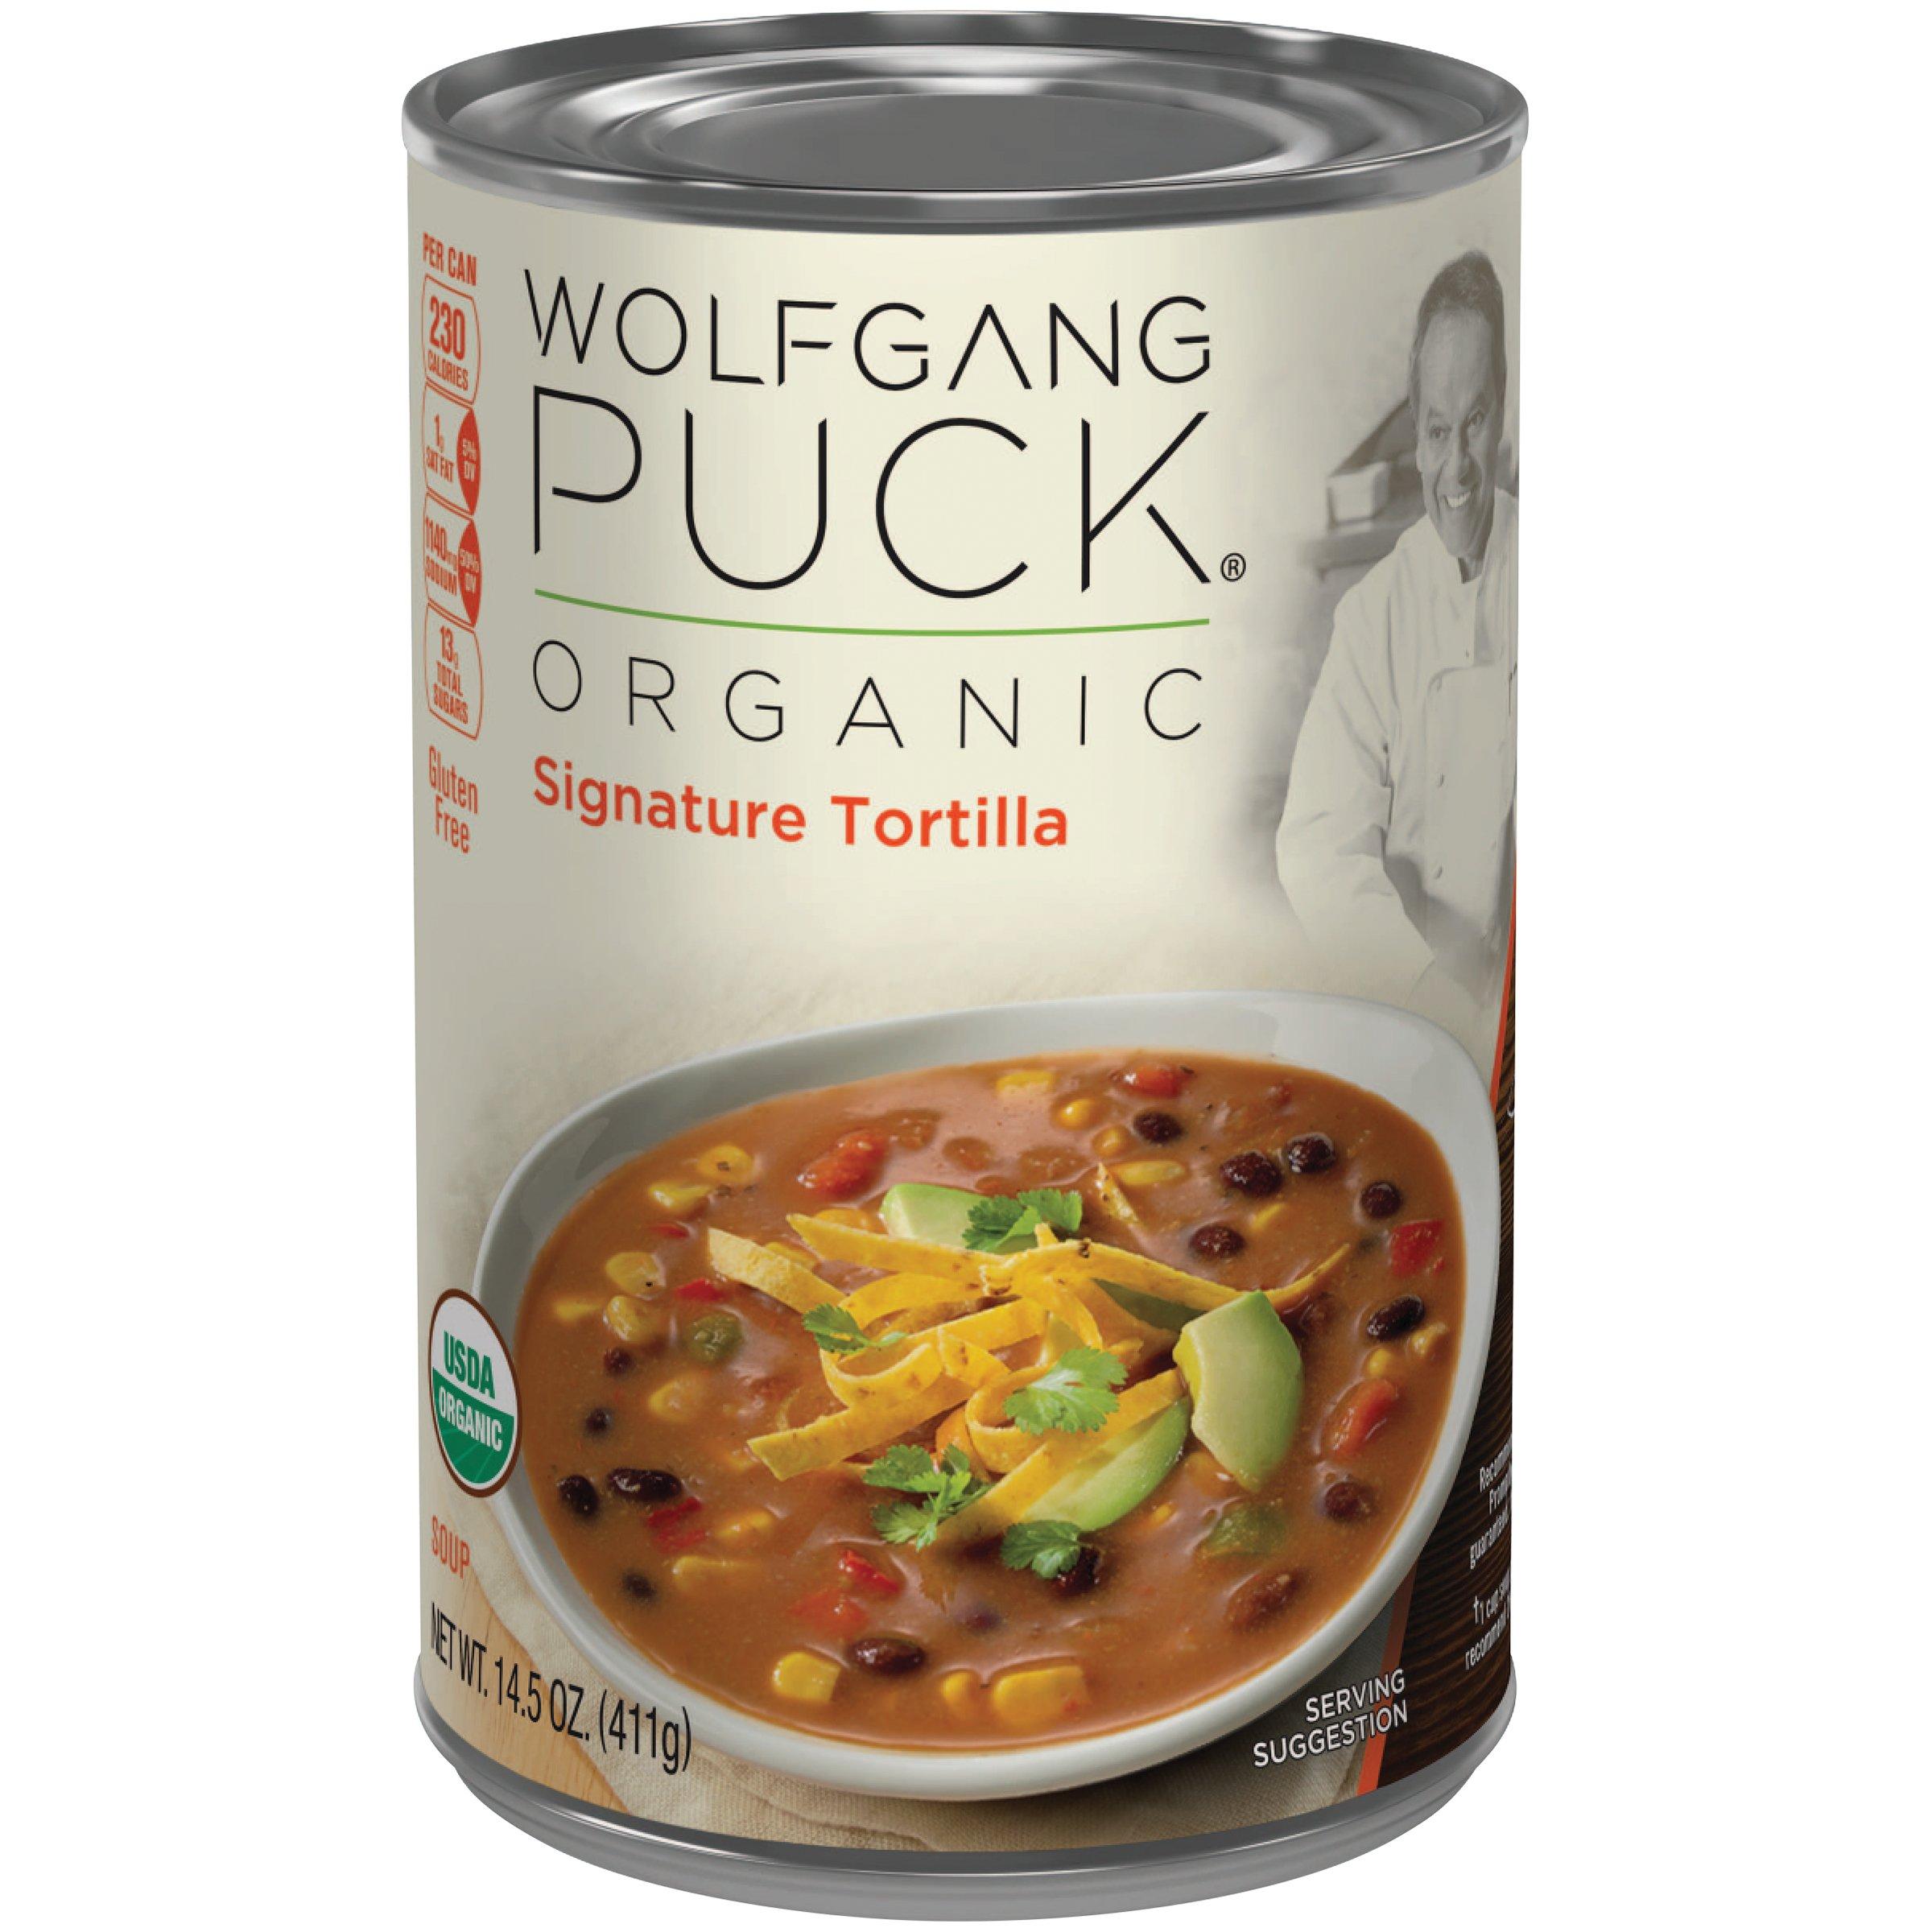 Wolfgang Puck Organic Soup, Signature Tortilla, 14.5 Ounce